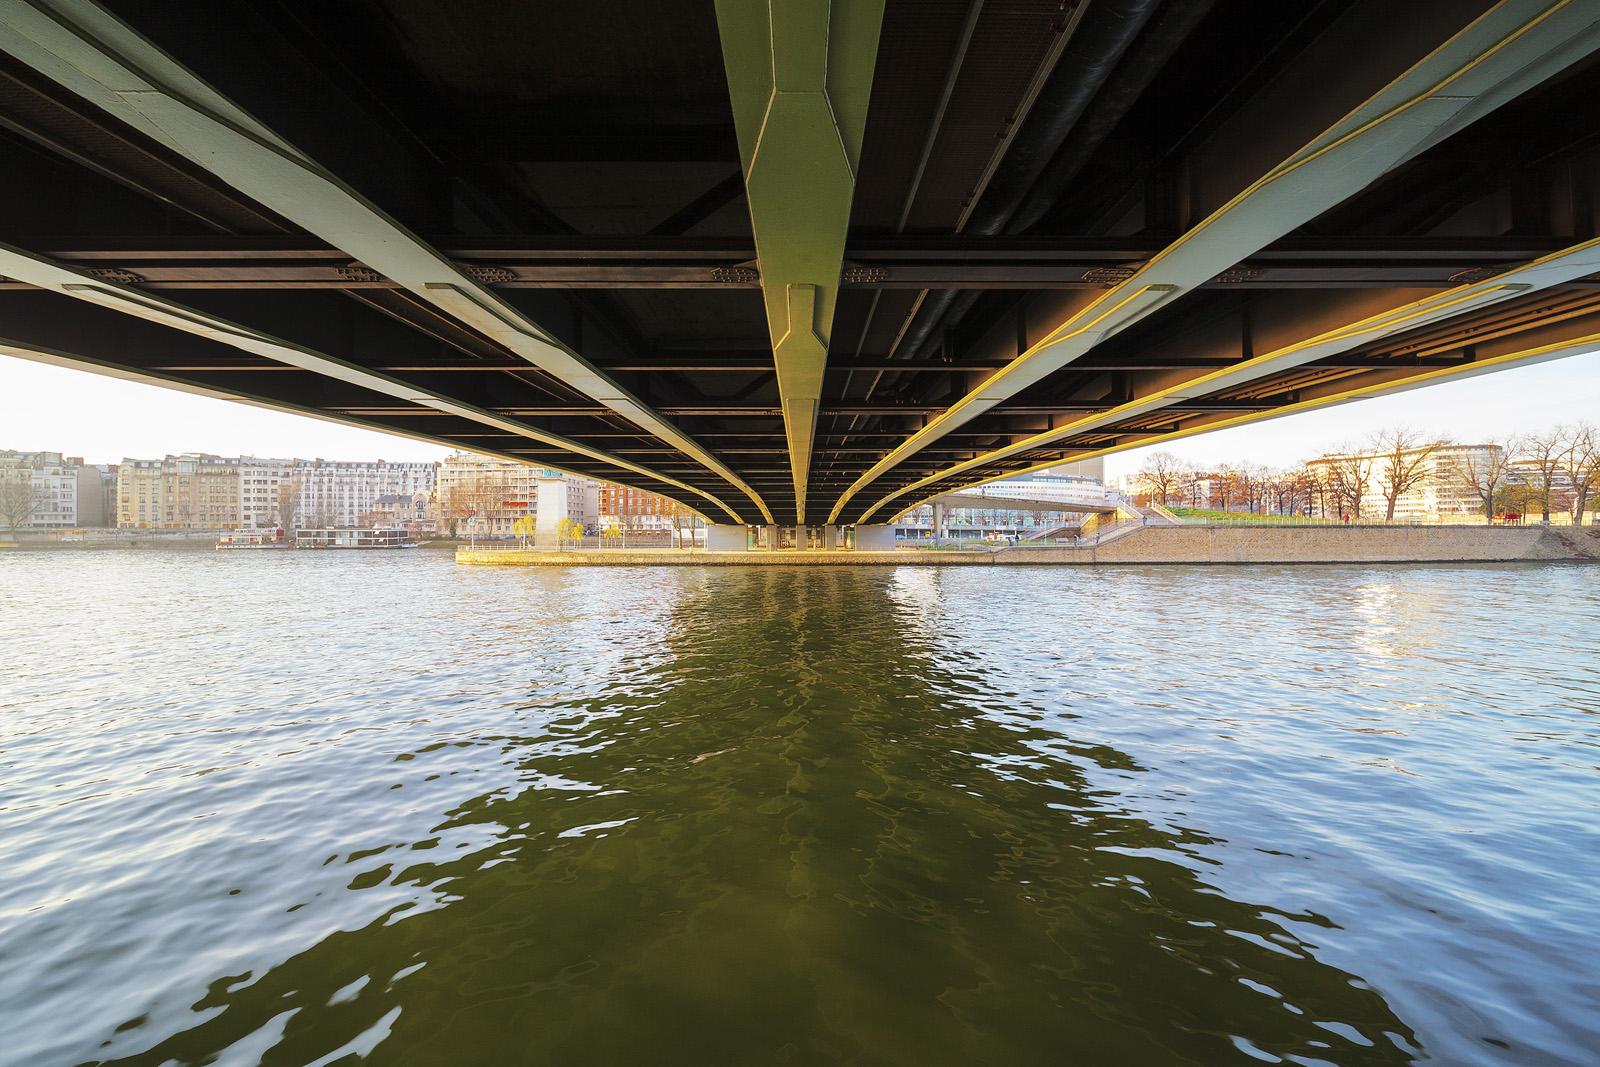 Pont de Grenelle : Laowa 12mm, F/8, 1/30s, 400iso